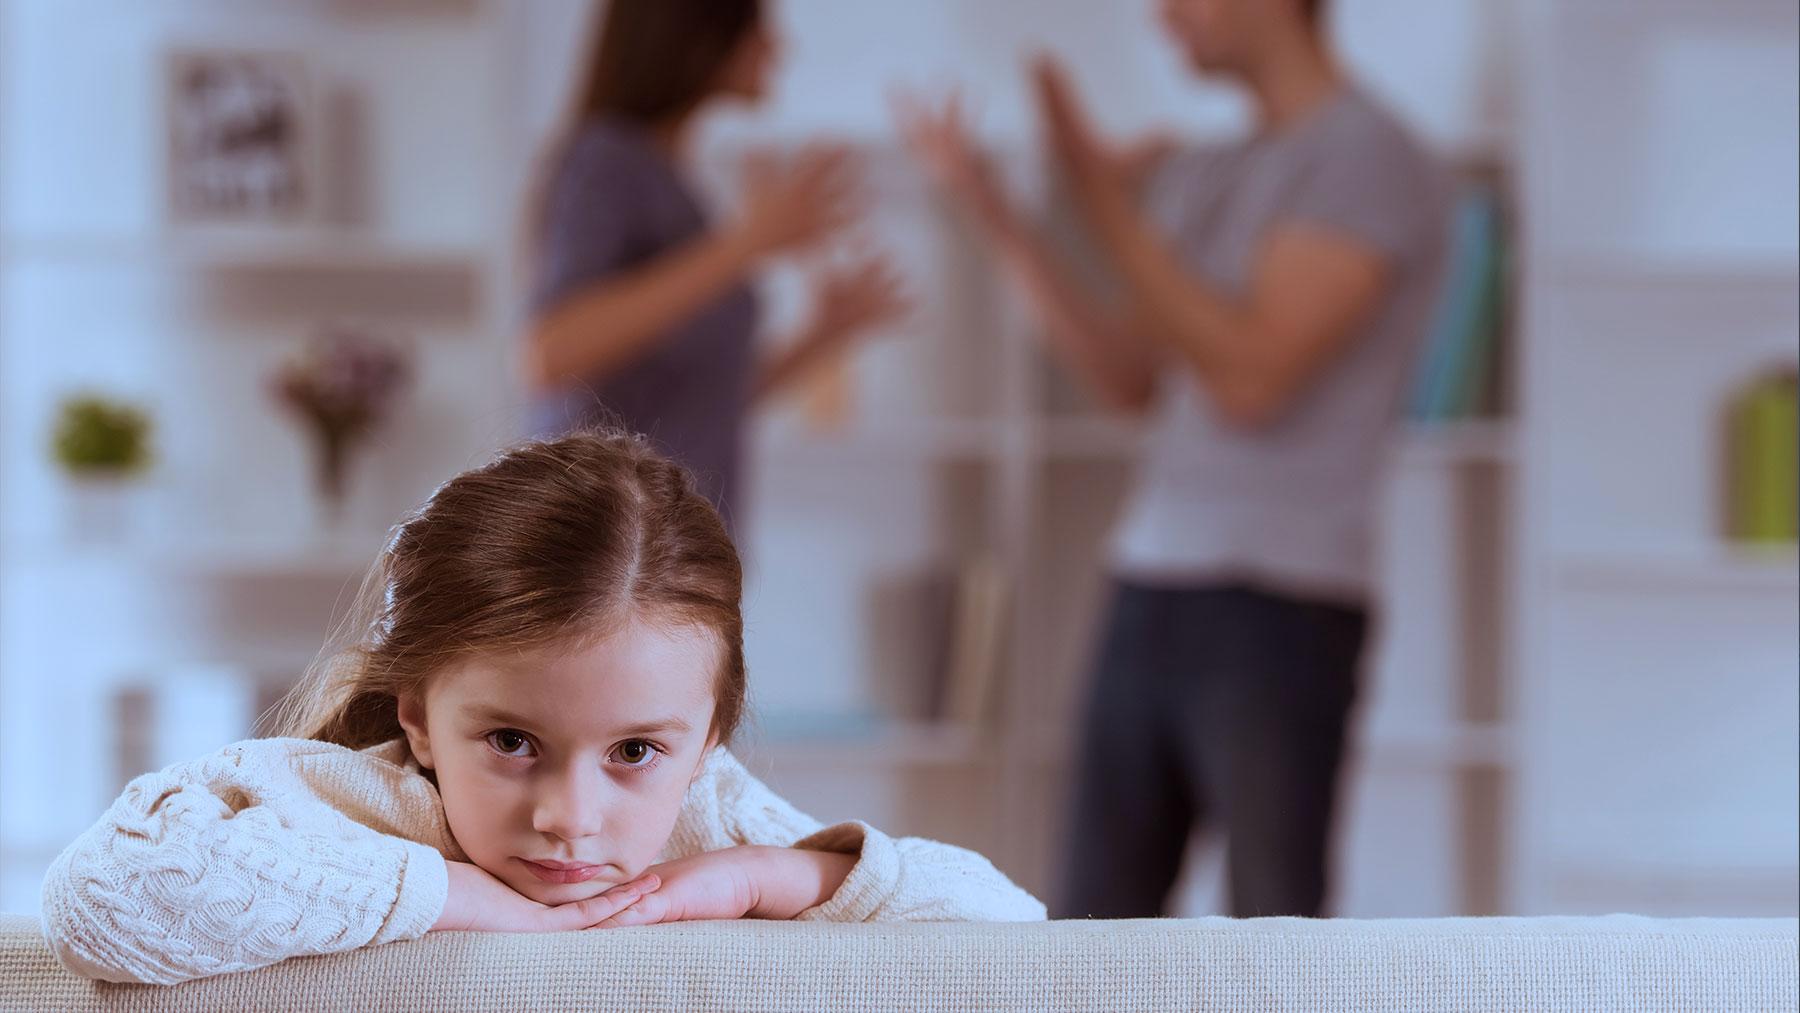 Meisje zit in zetel met ruziënde ouders op de achtergrond.